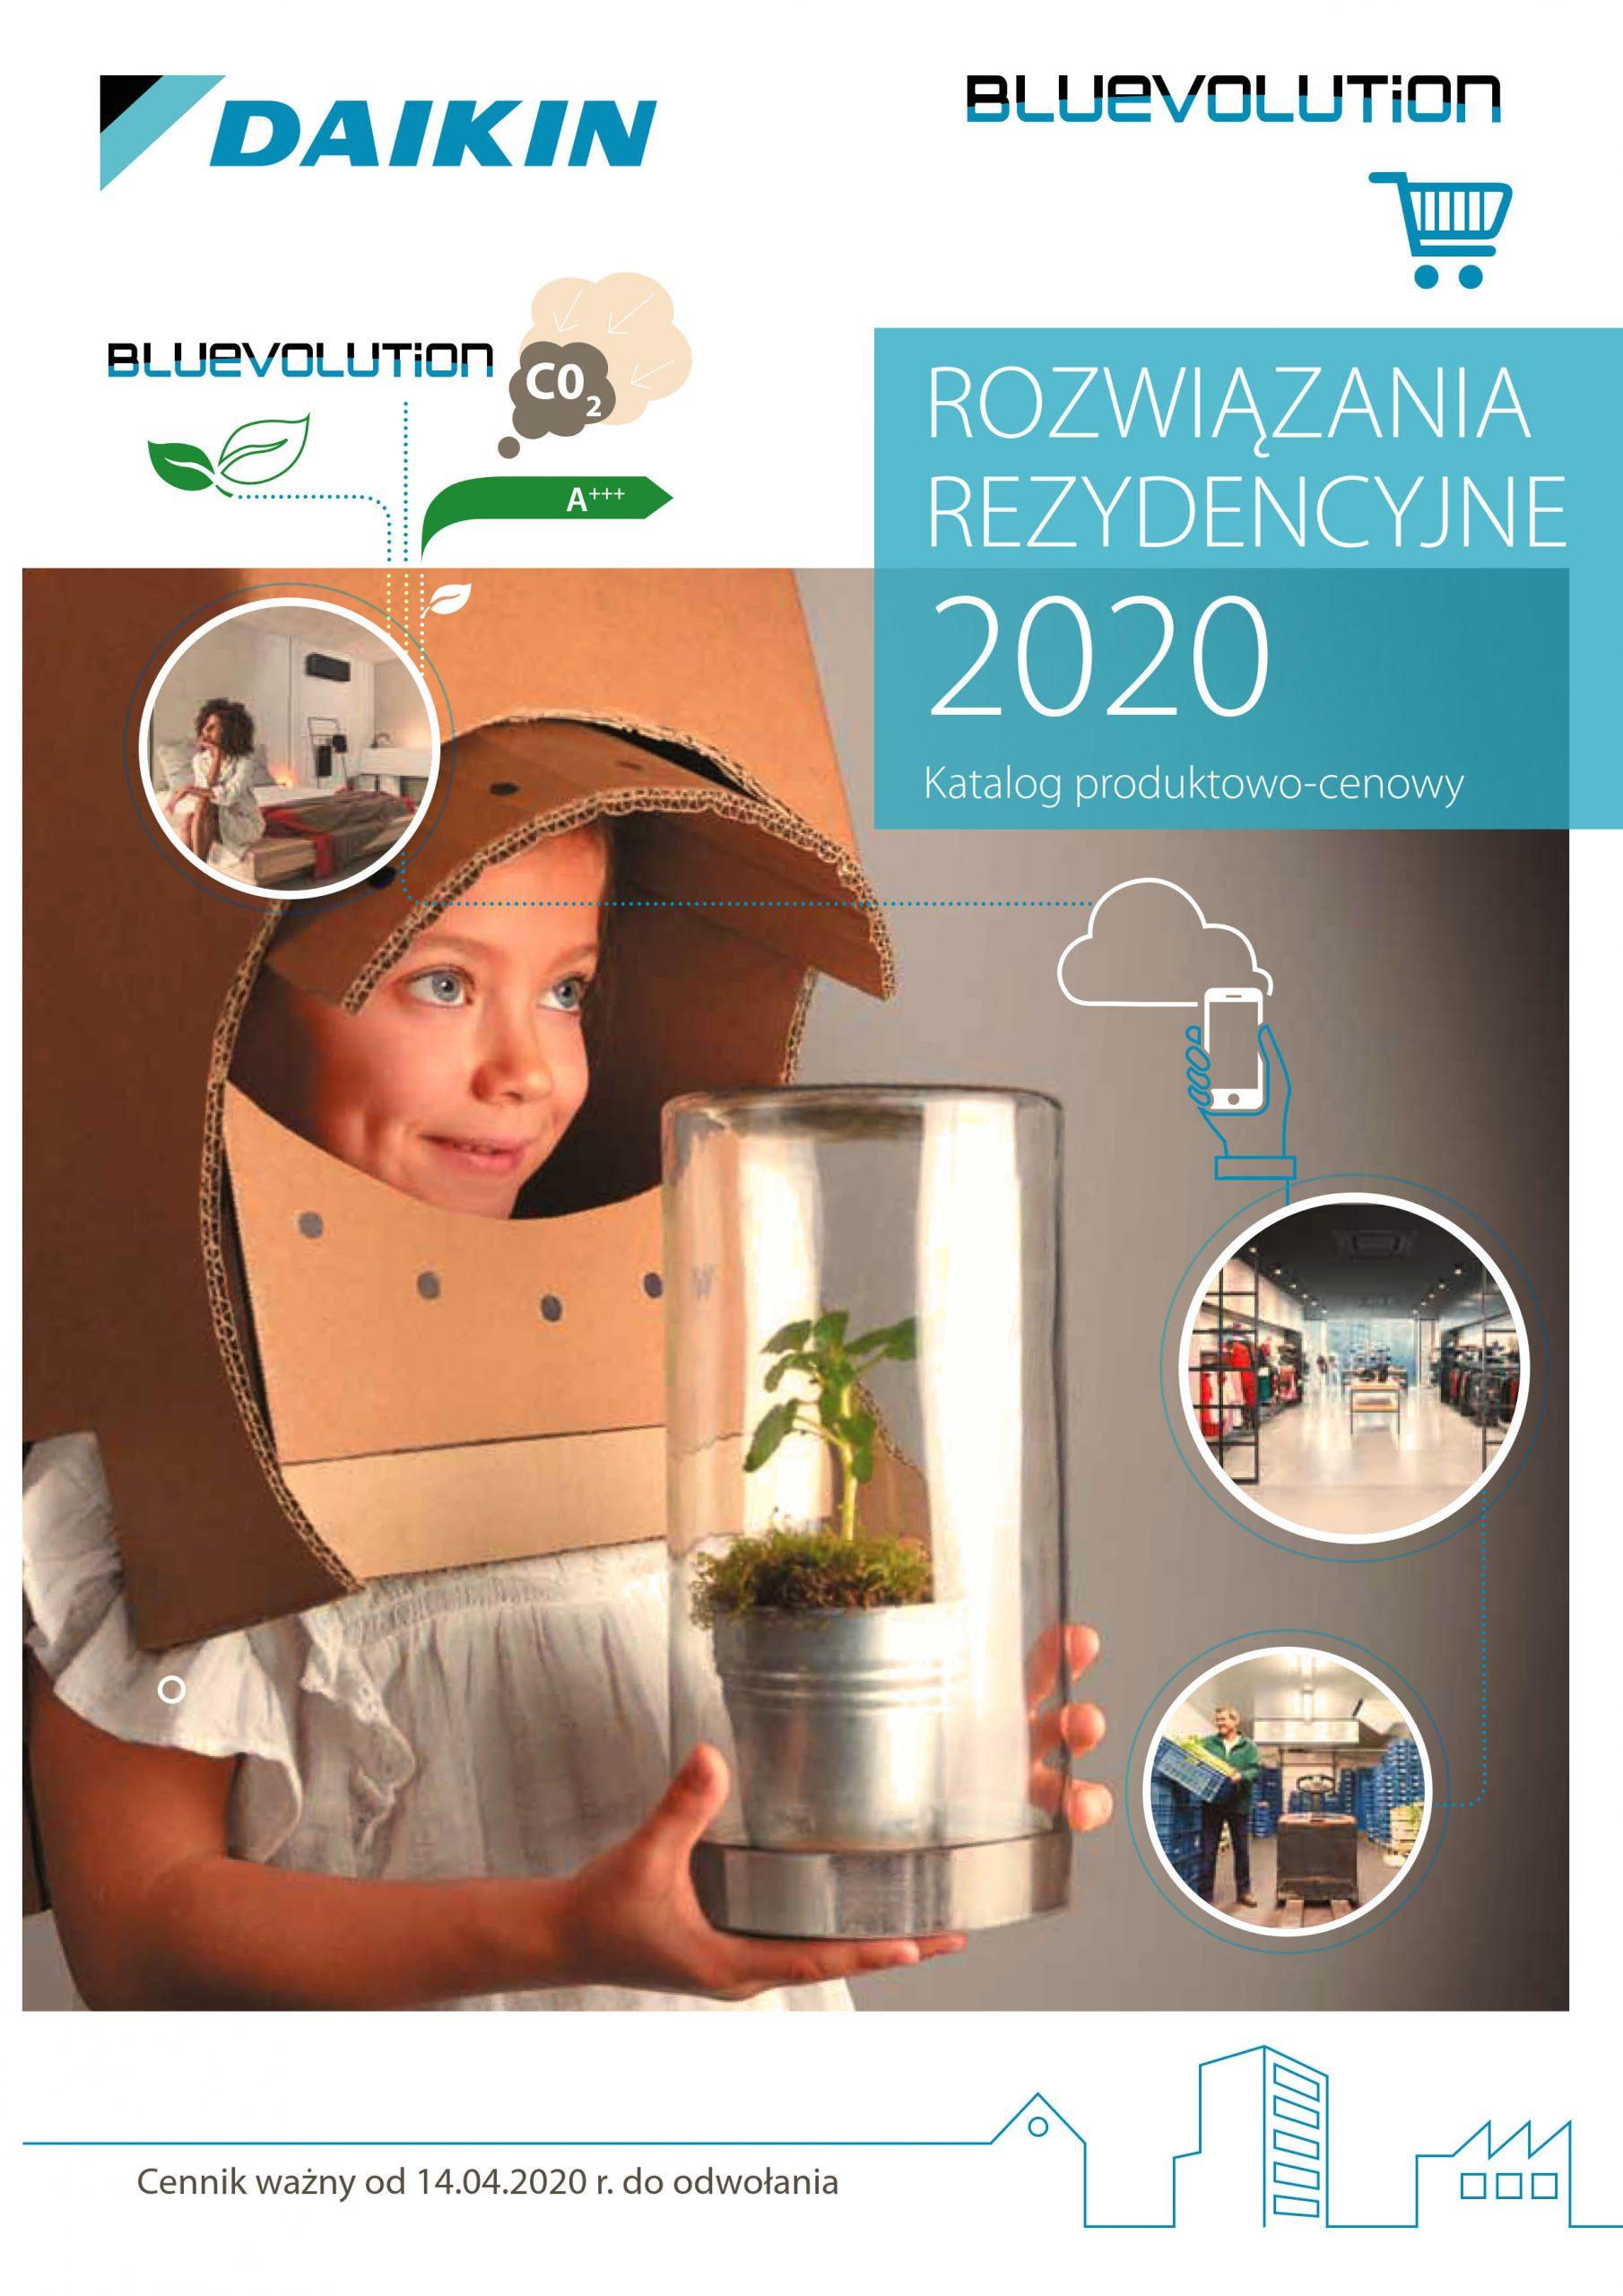 https://thermostahl.pl/assets_ts/uploads/2020/04/DAIKIN-Cennik-Rozwiązań-Rezydencyjnych-24.04.2020.pdf